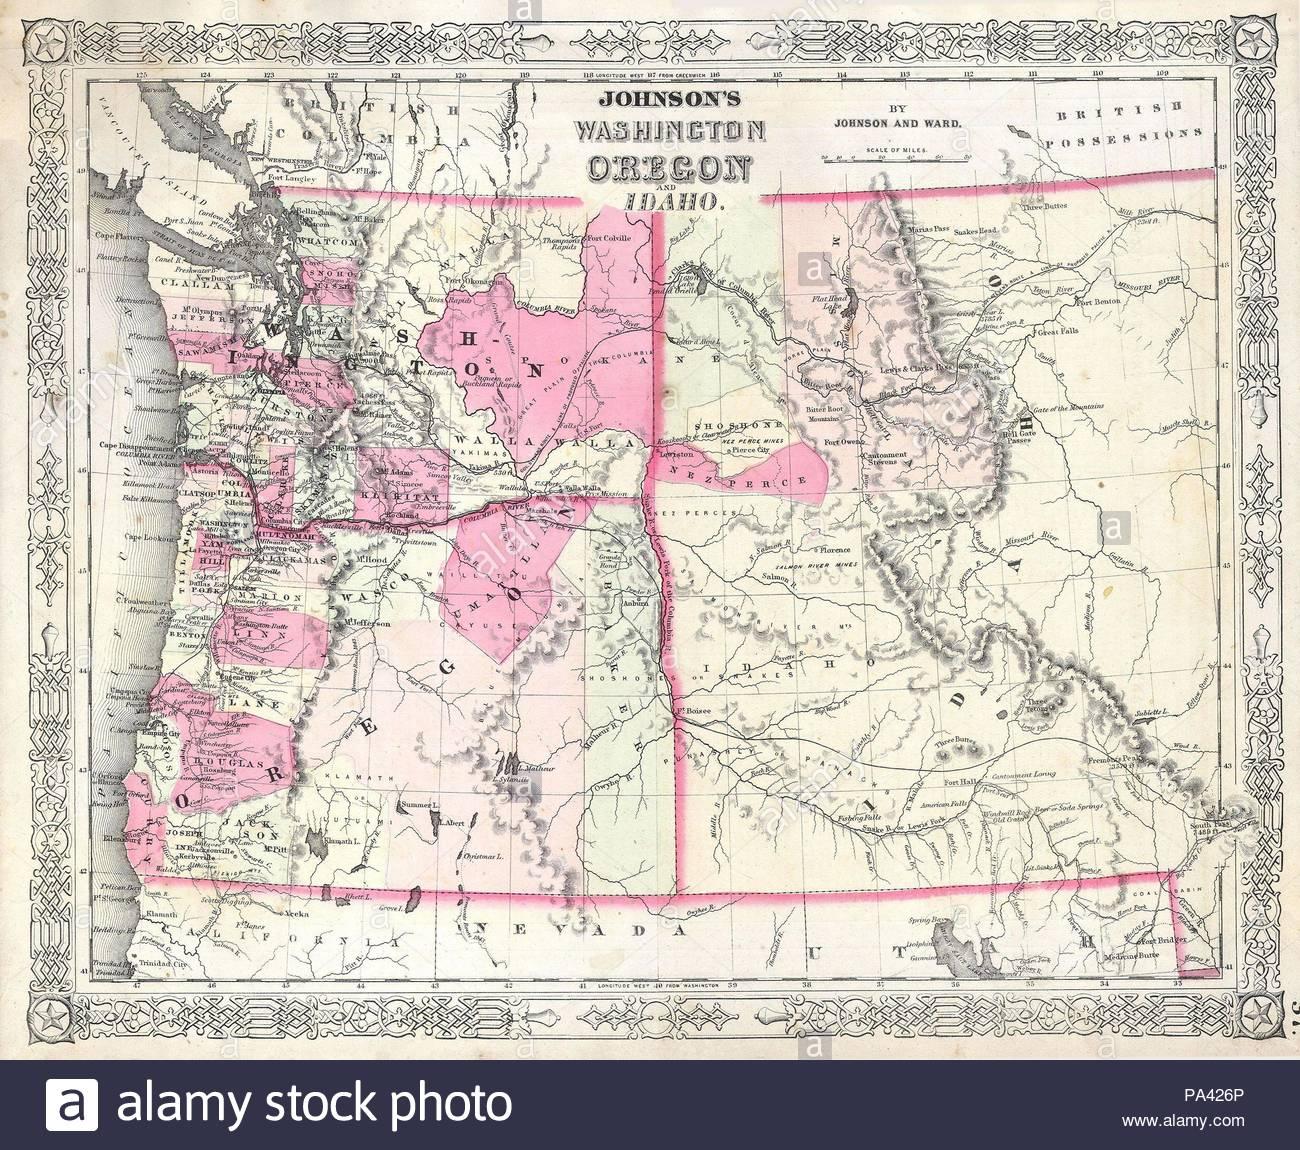 Montana And Idaho Map.1864 Johnson Map Of Washington Oregon And Idaho Wyoming And